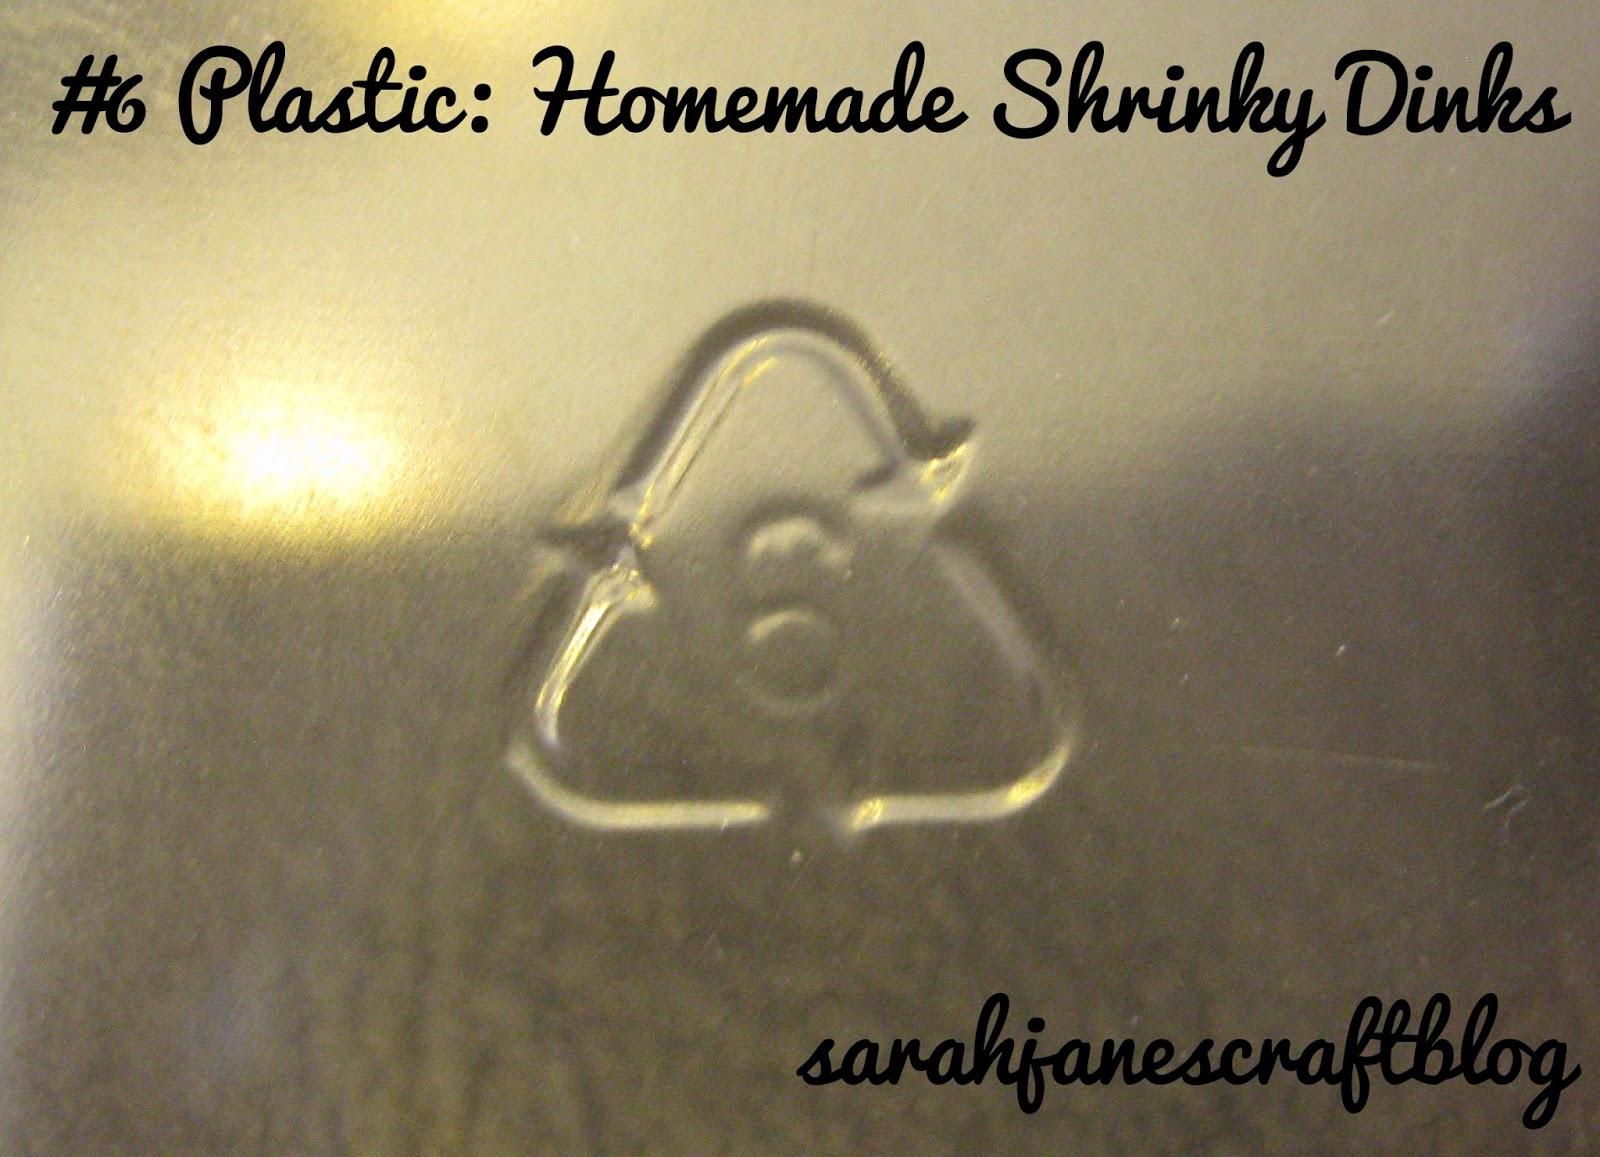 Sarah Jane S Craft Blog Homemade Shrinky Dinks